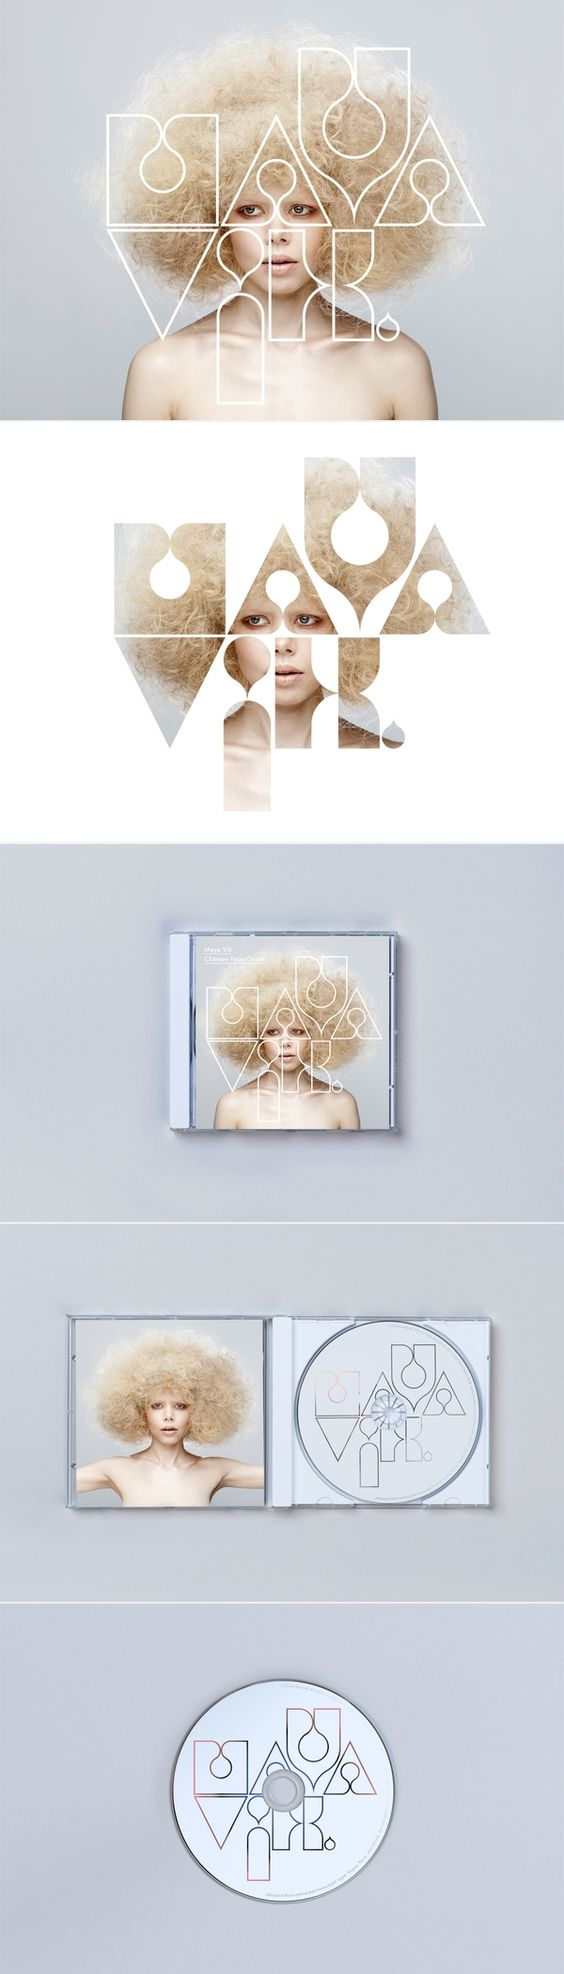 Maya Vik - Talent Branding by Gary Swindell